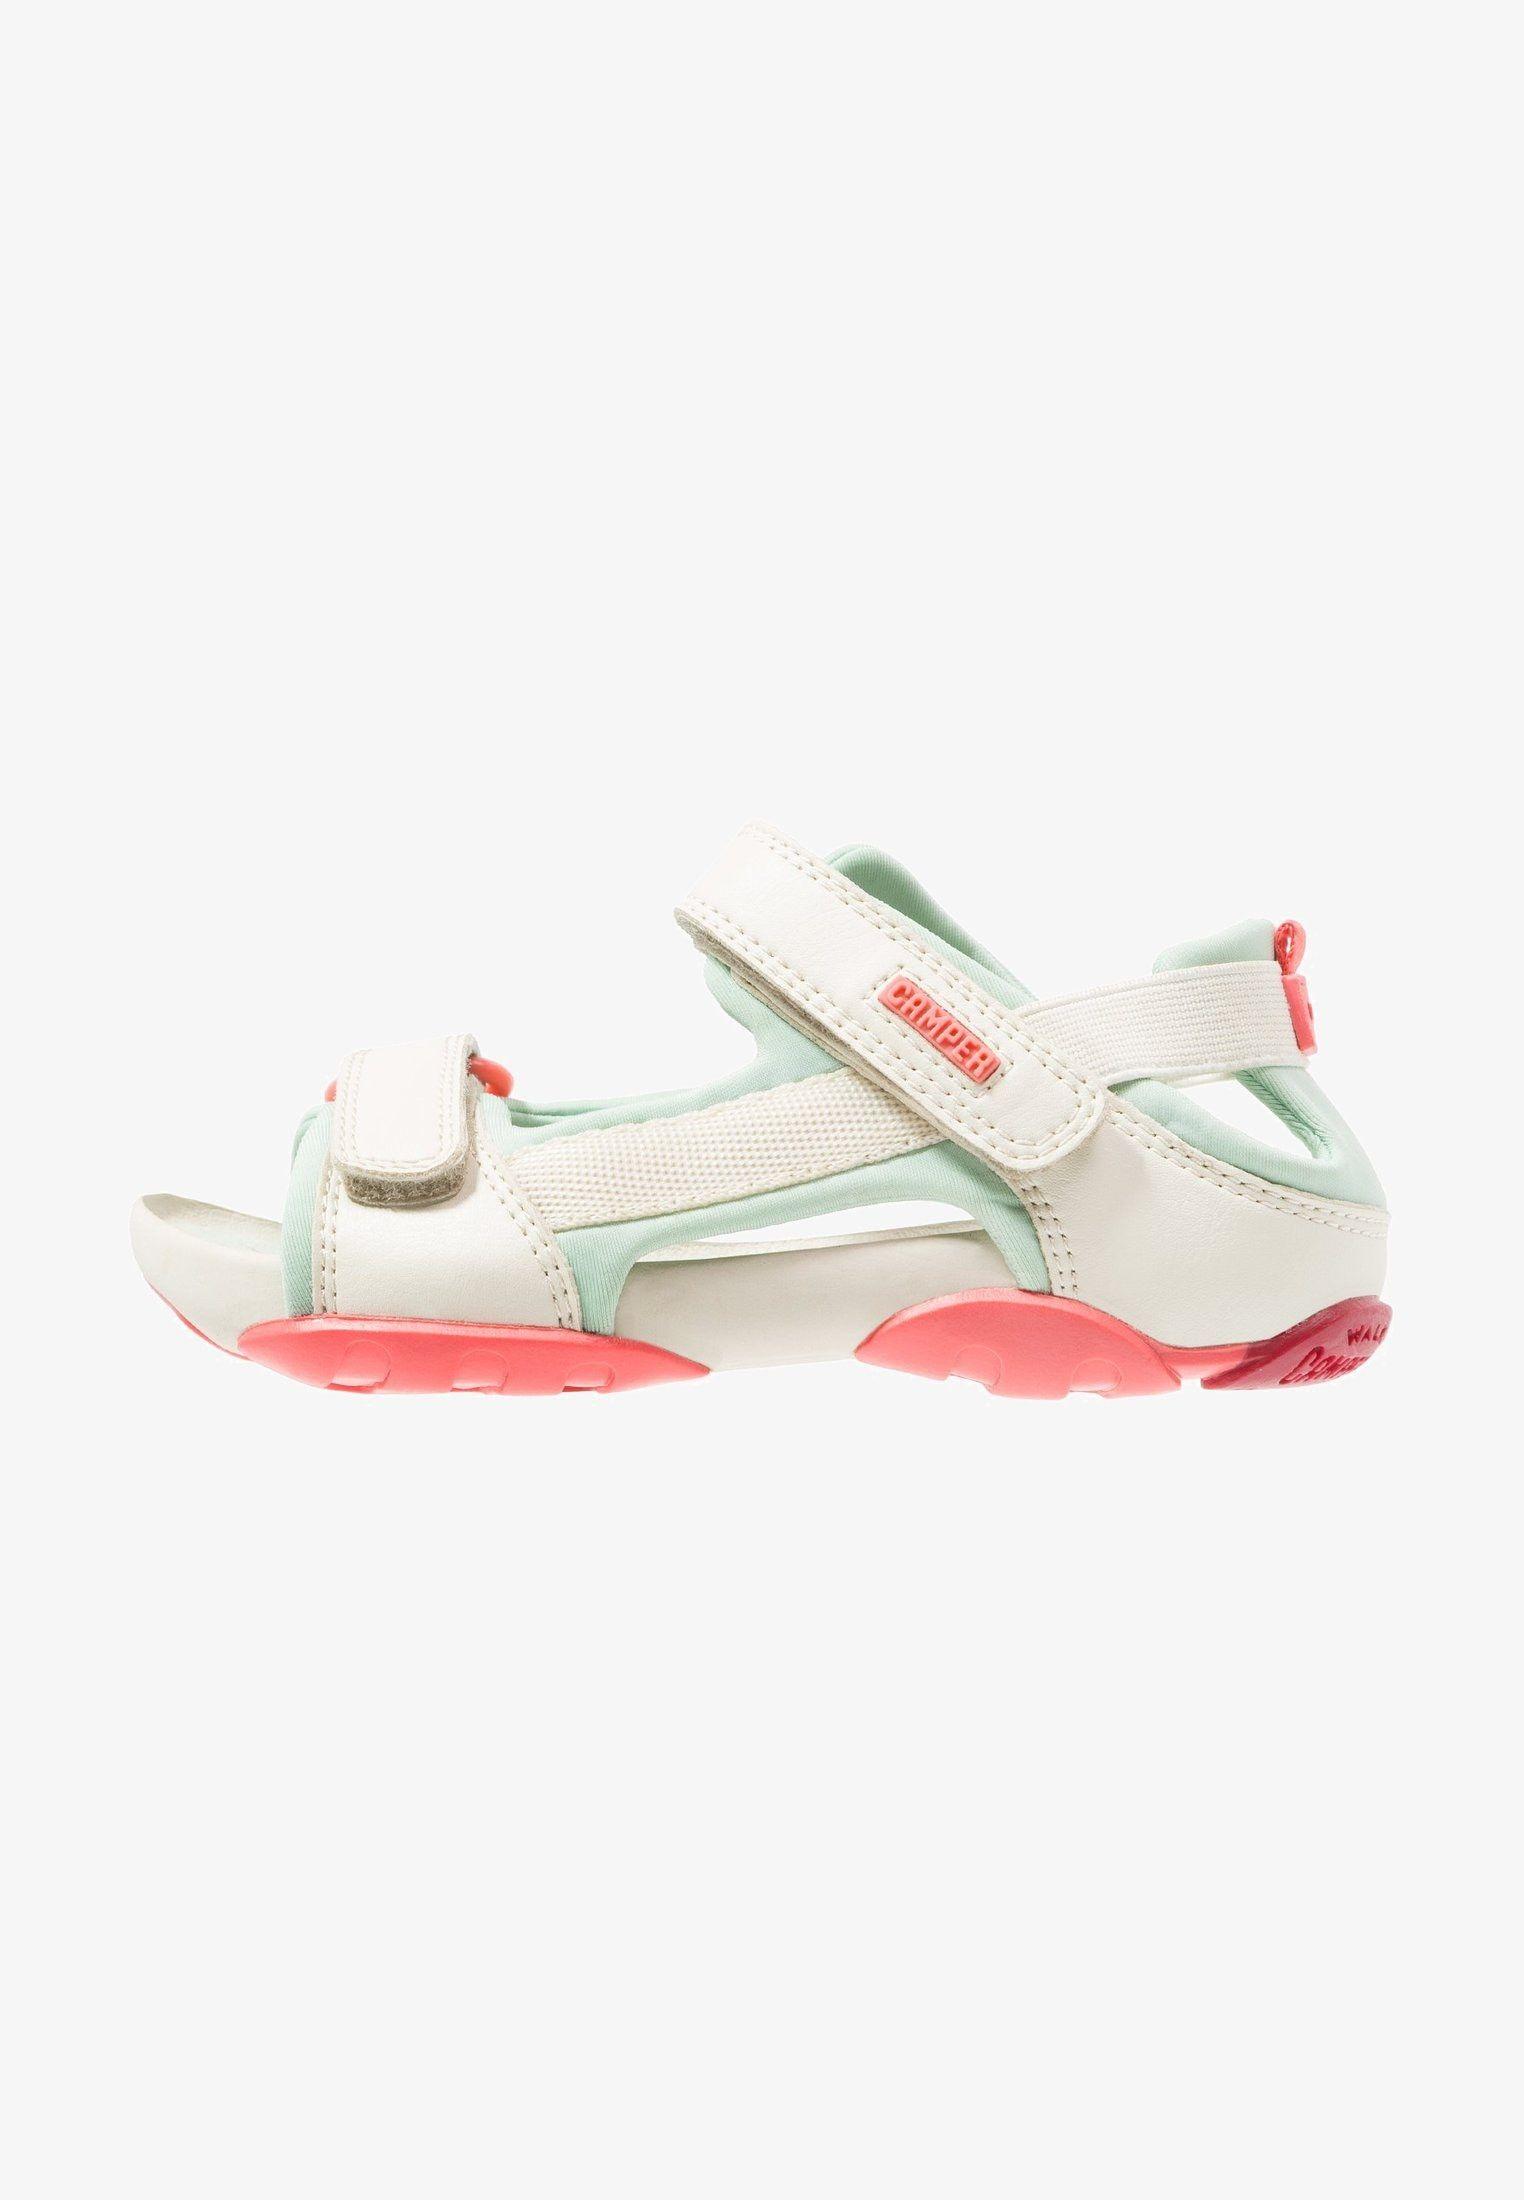 Ous Kids Riemensandalette Multicolor Zalando De In 2020 With Images Kids Sandals Girls Sandals Girls Shoes